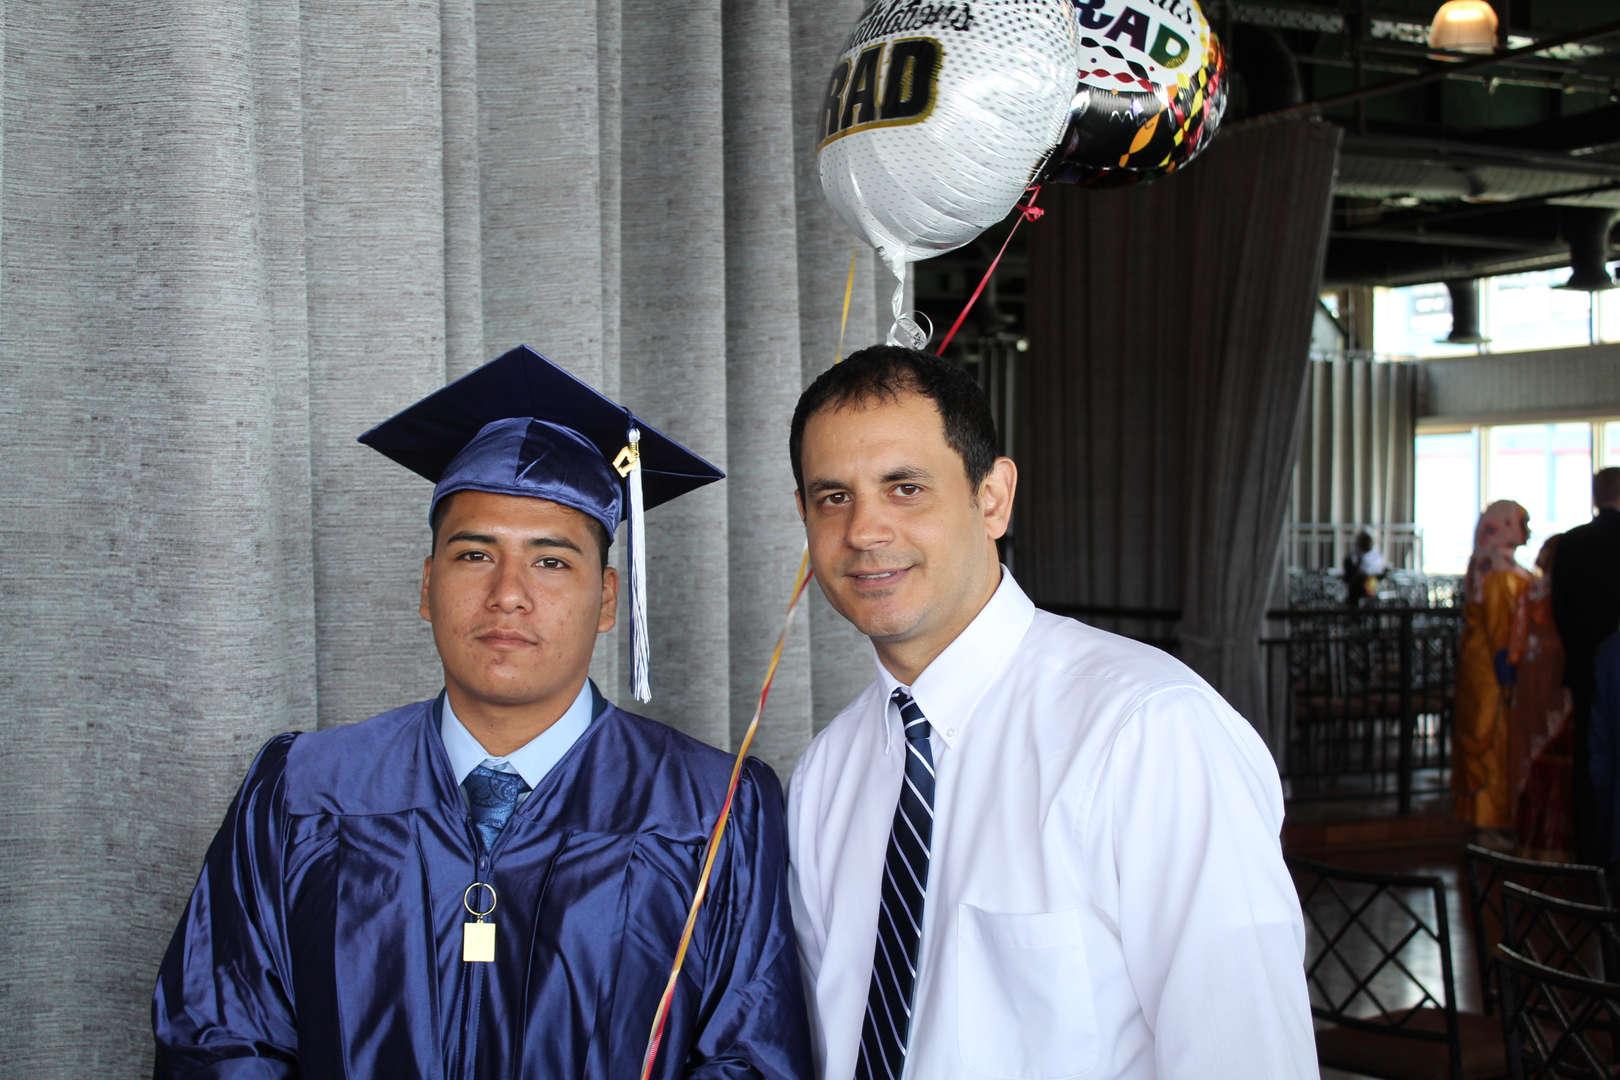 Mr. Olivo and Graduate